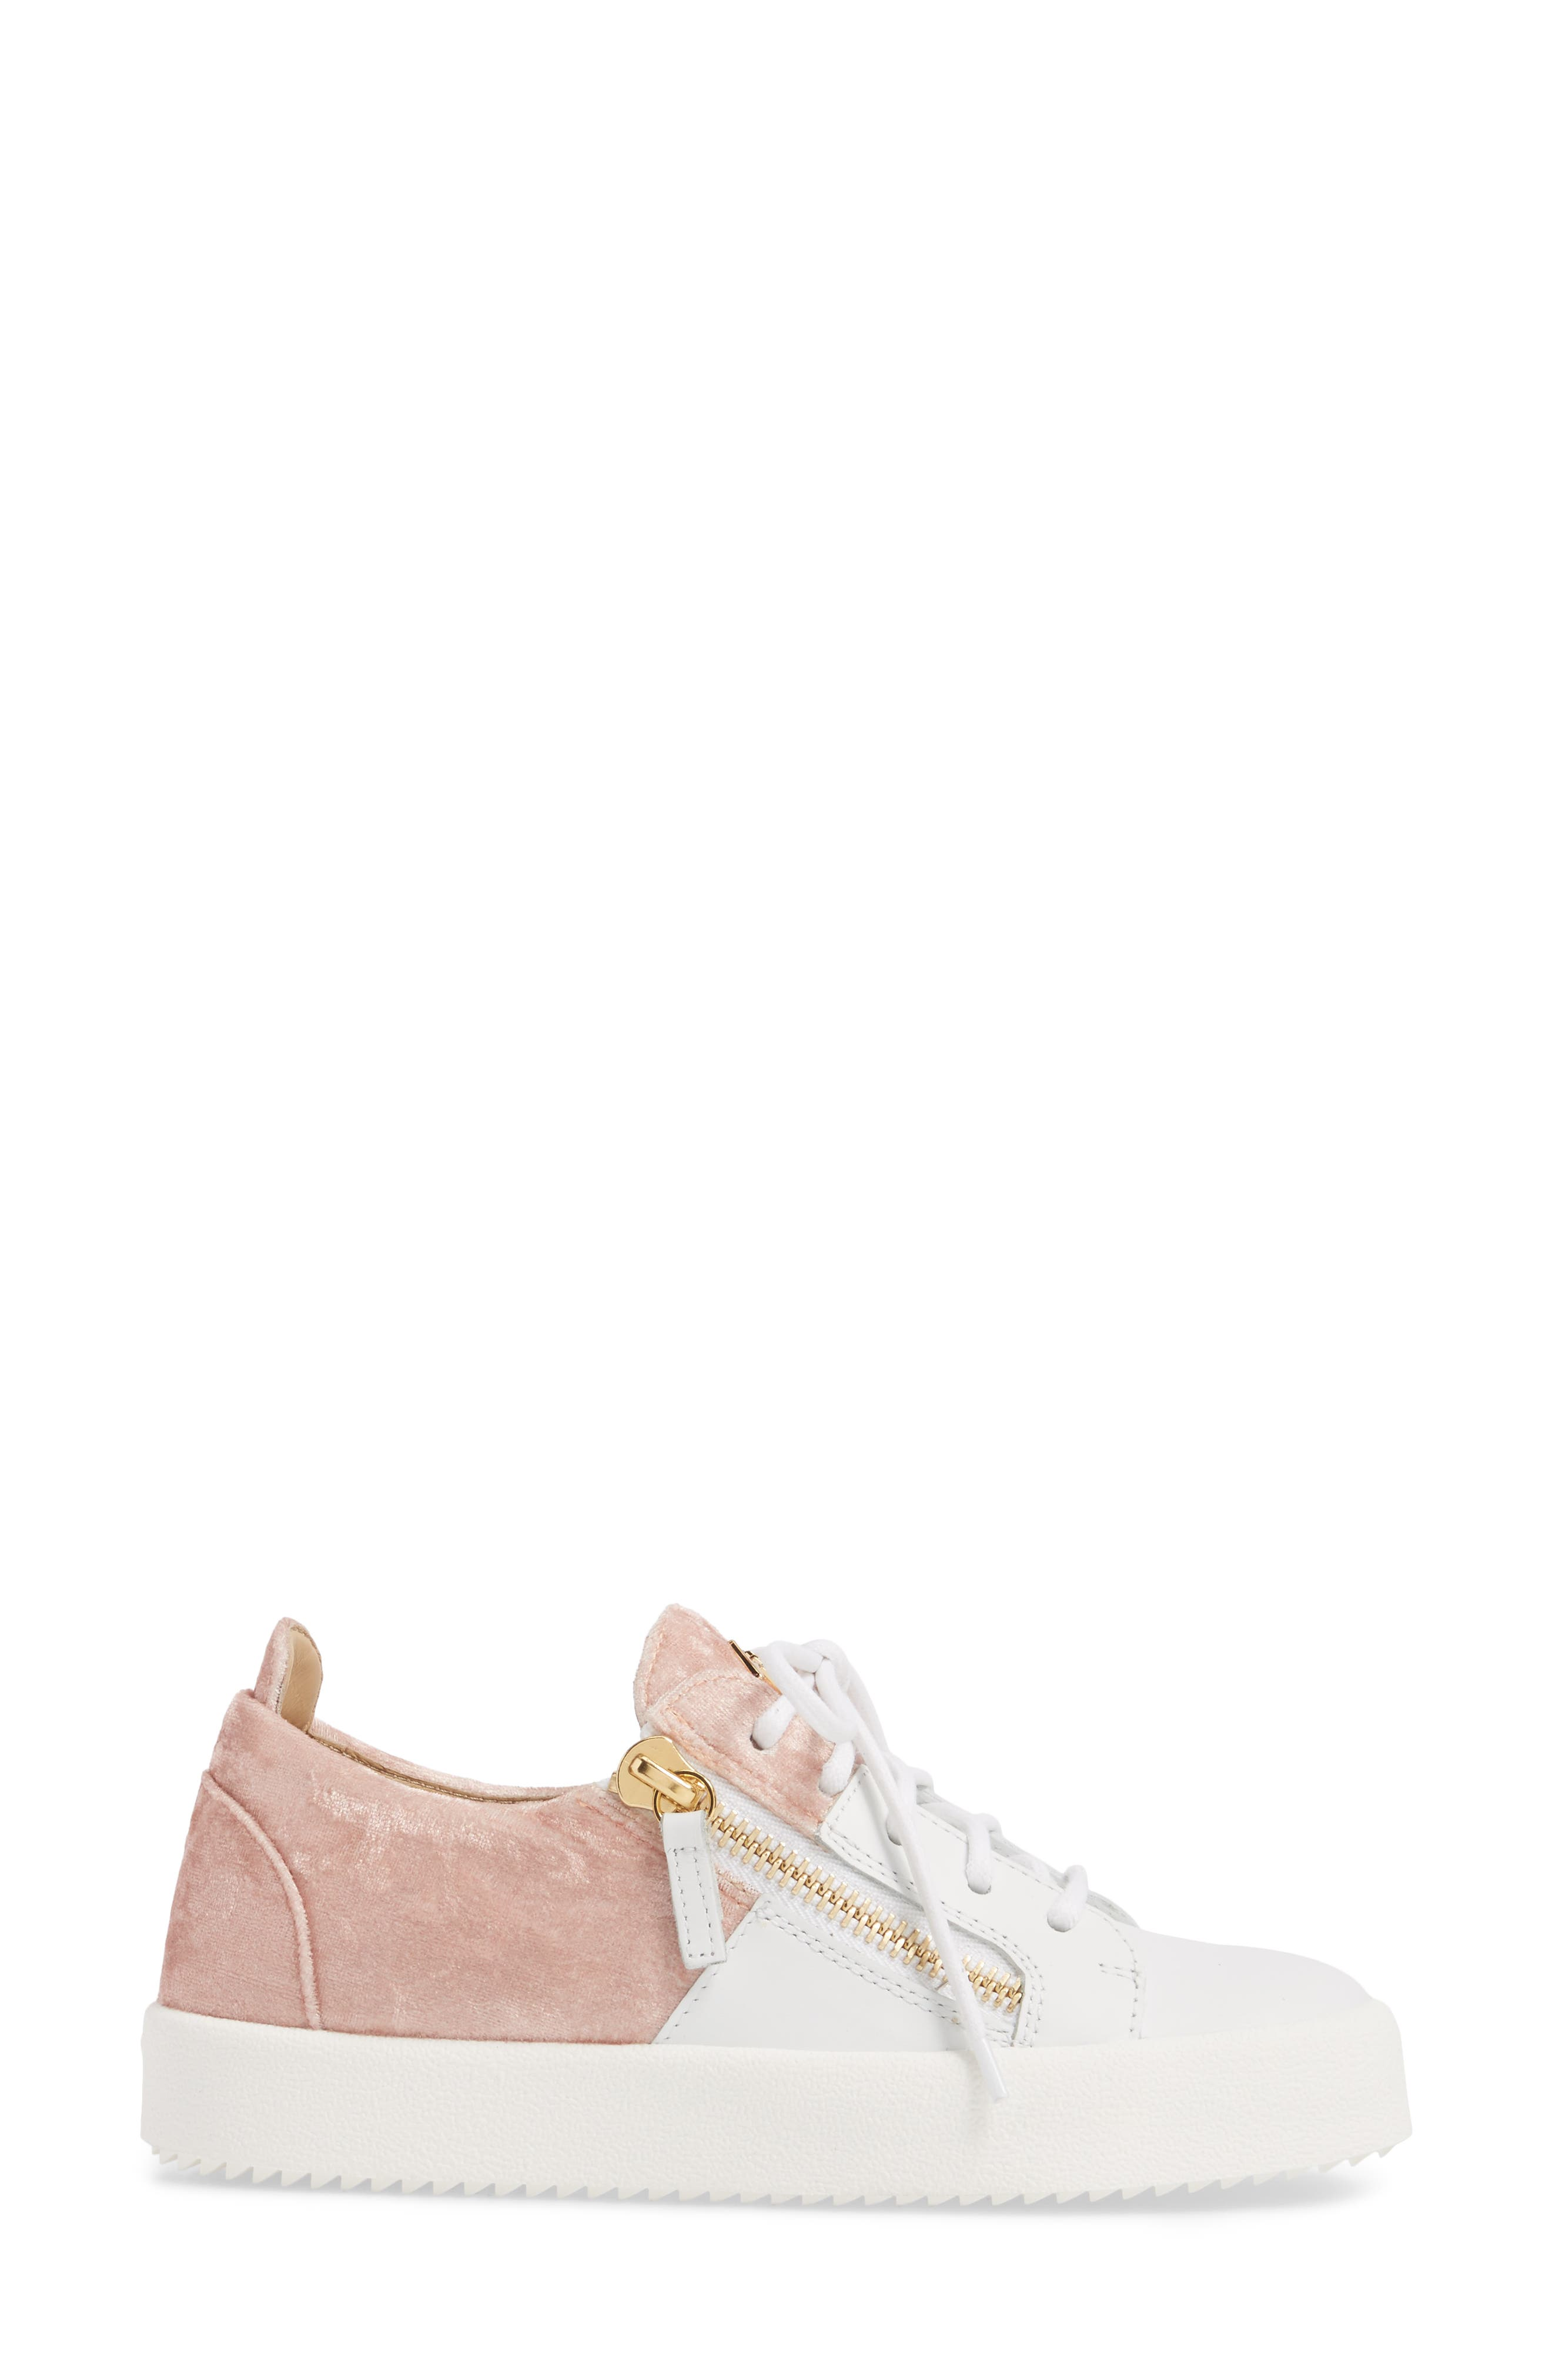 Alternate Image 3  - Giuseppe Zanotti Mid Top Platform Sneaker (Women)